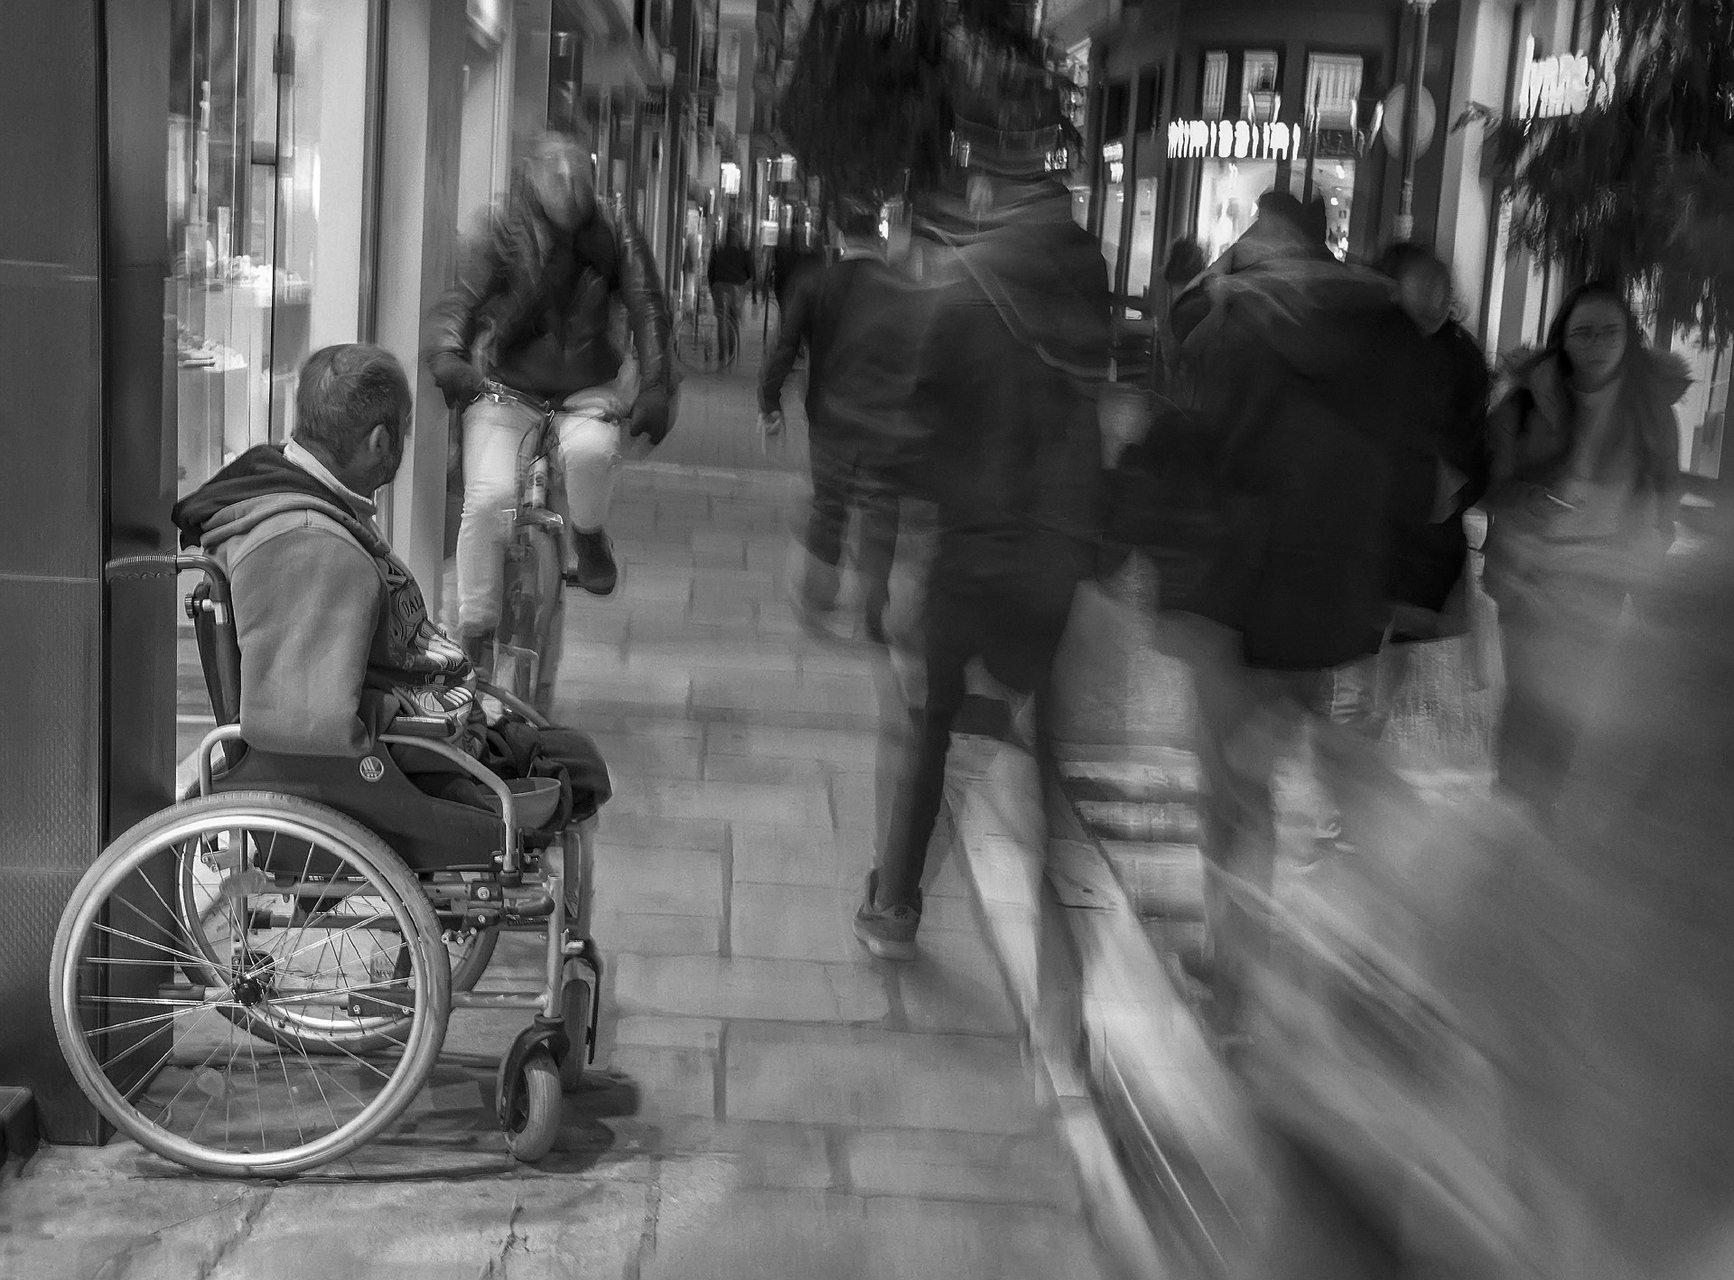 Онези ,които бързат | Author TEODORA IVANOVA - dorascal18 | PHOTO FORUM